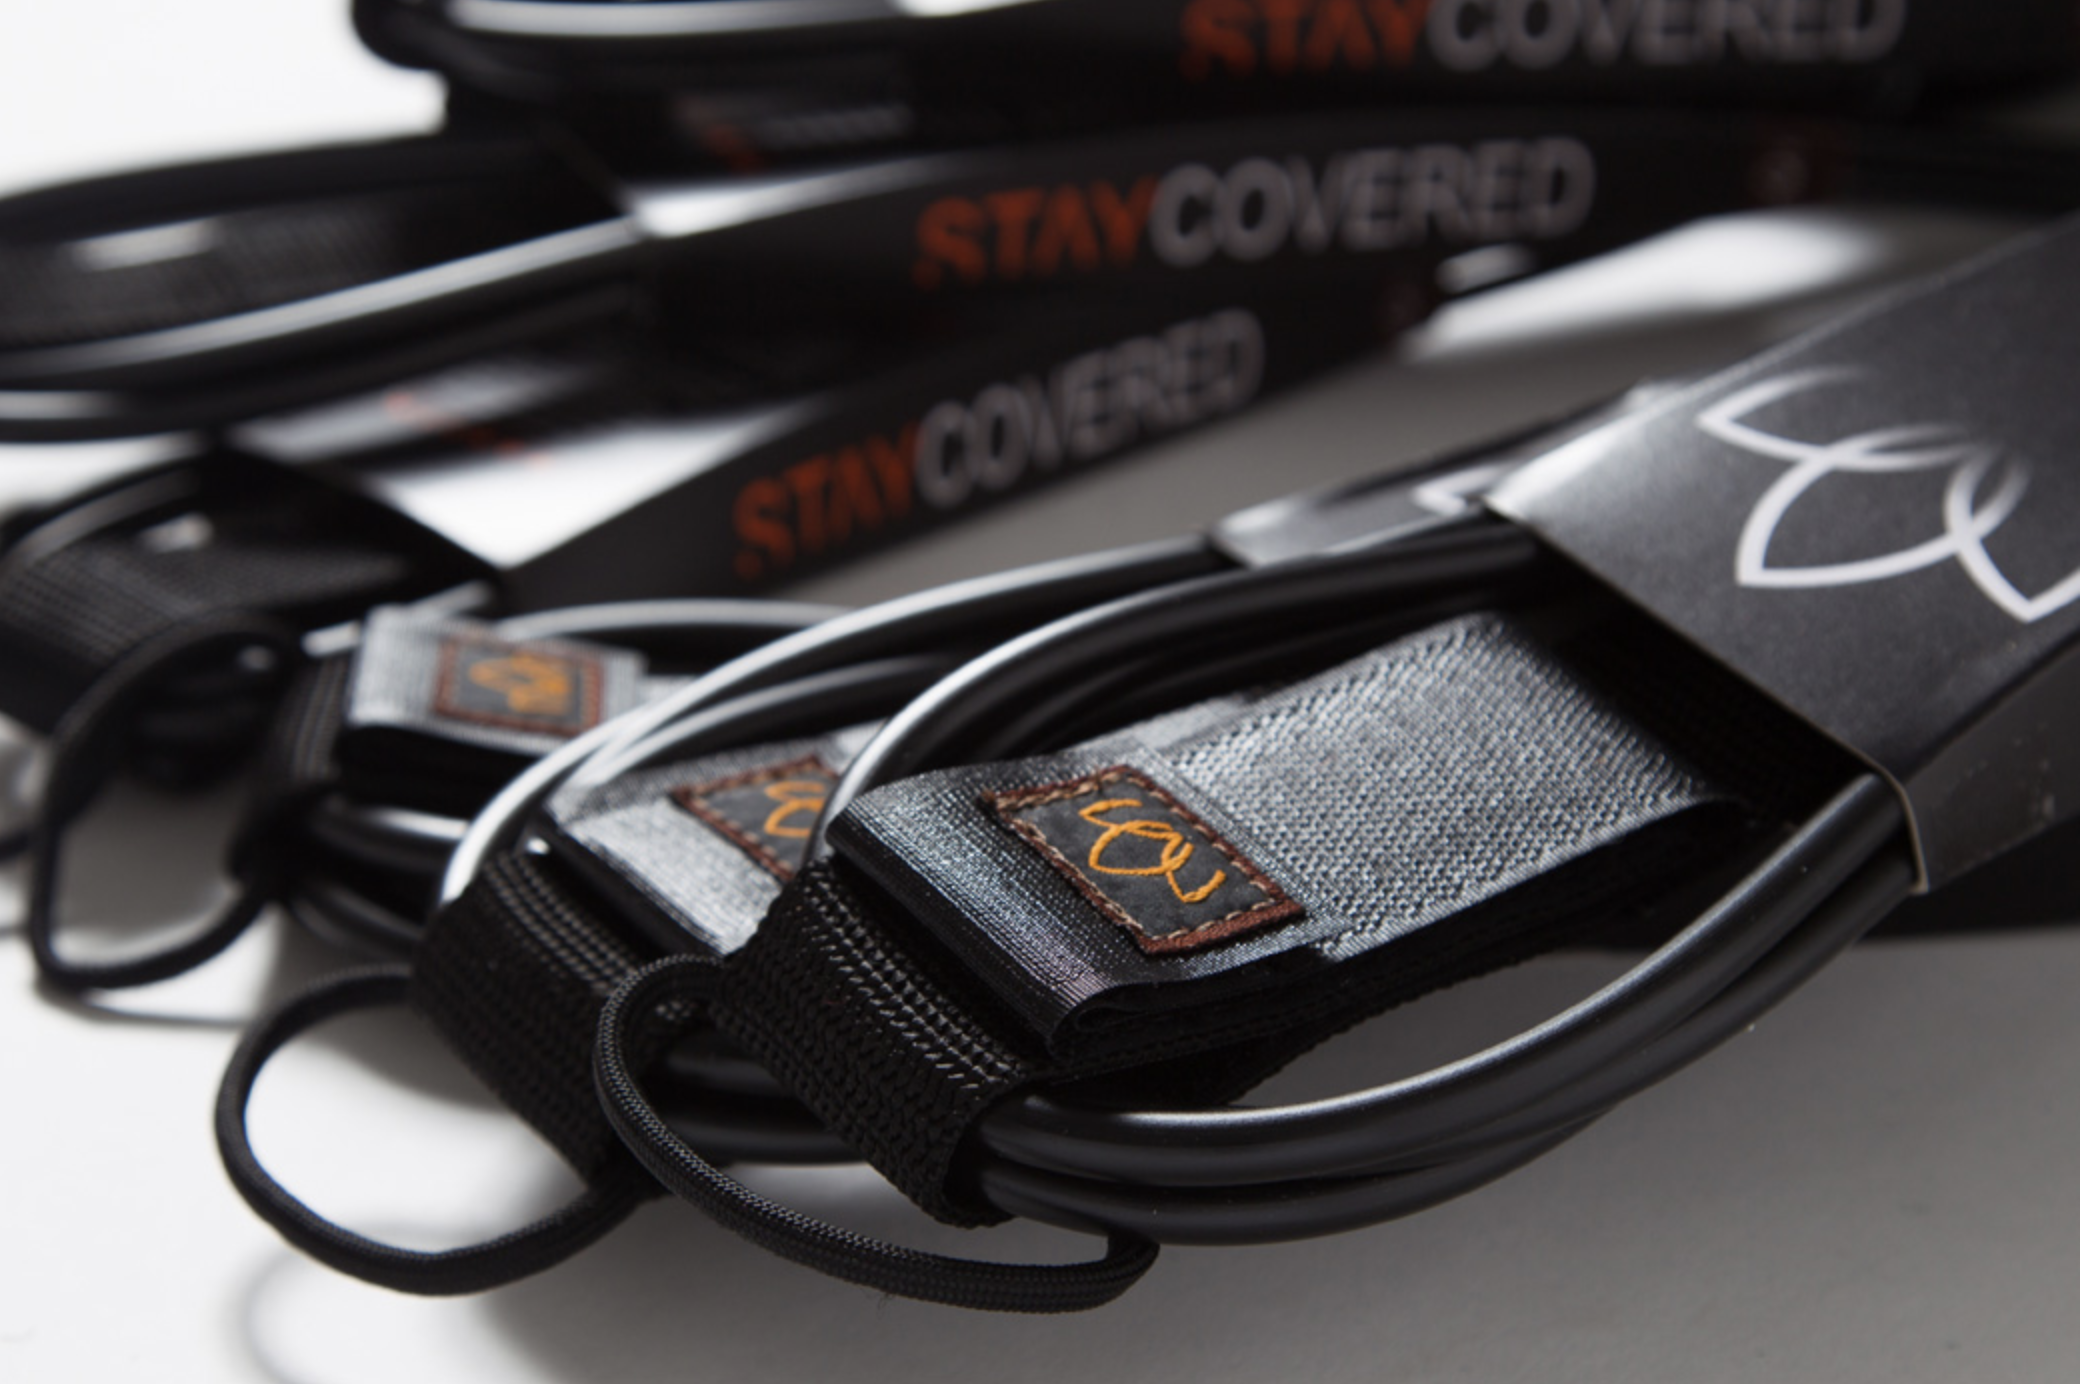 [STAY COVERED] リーシュ 6ft STANDARD mat black